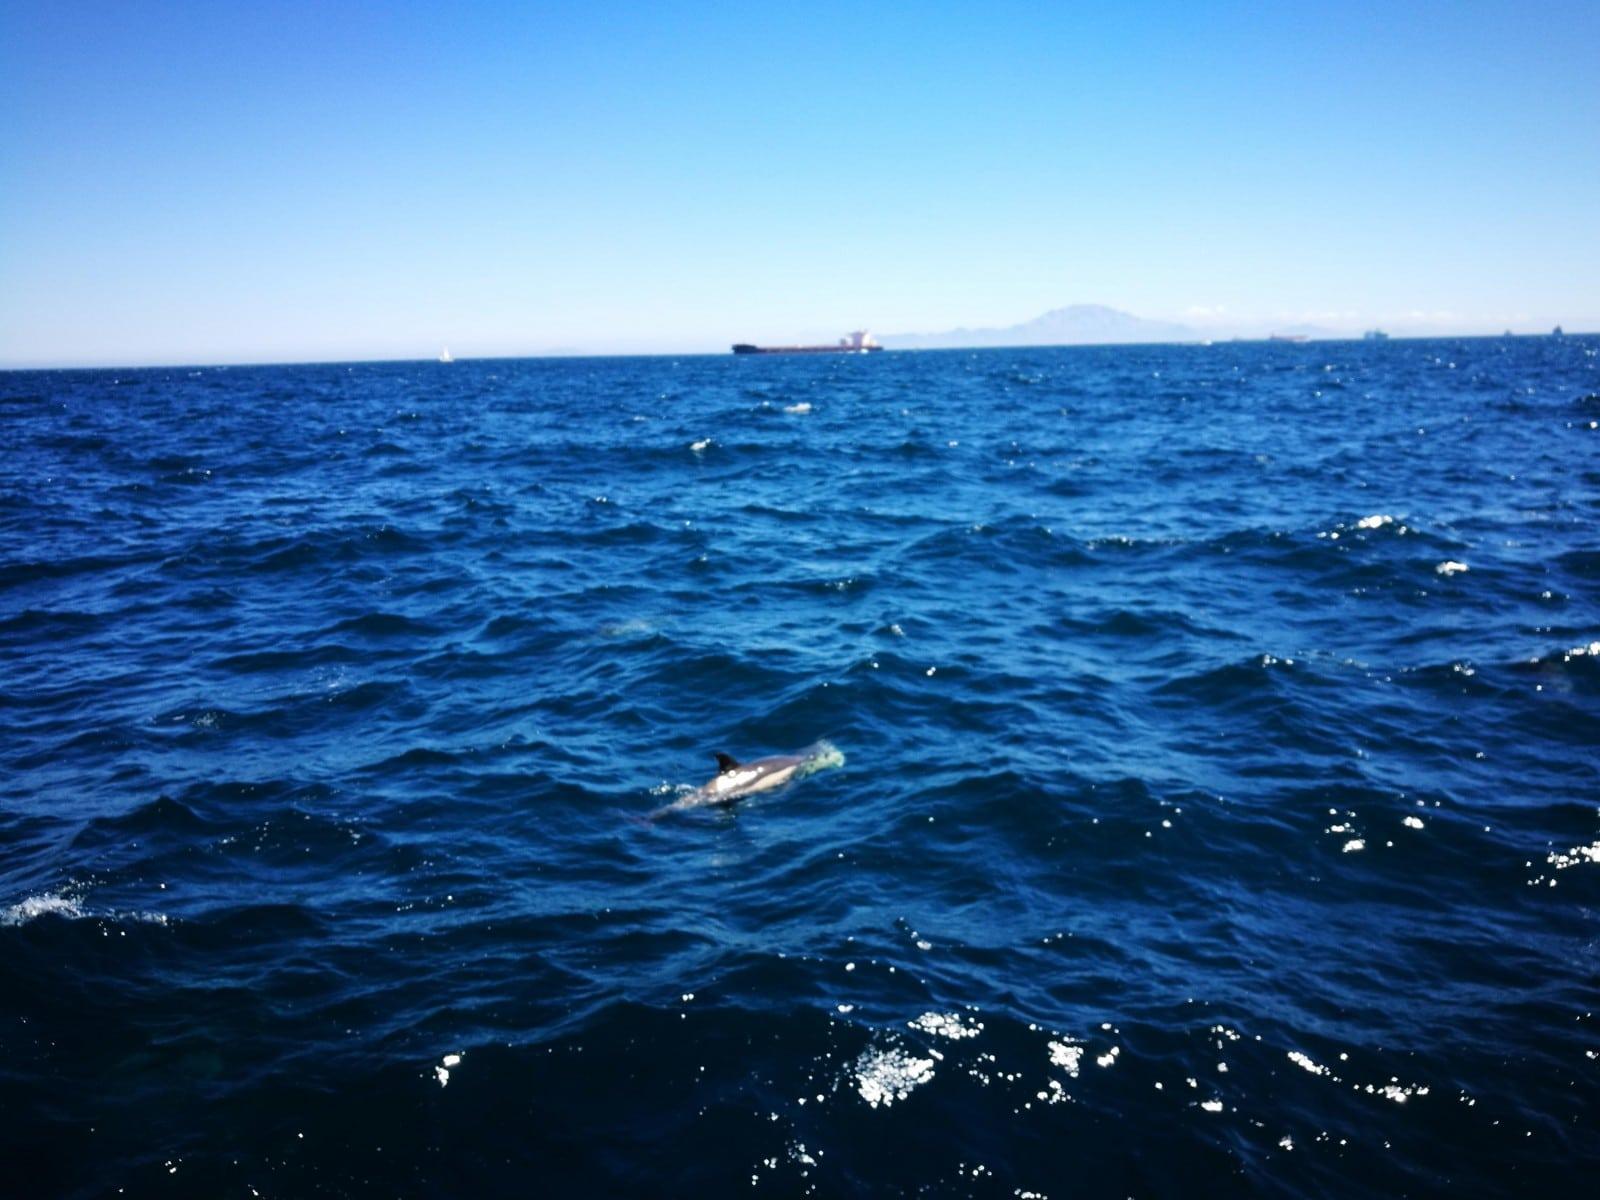 23-jun-2019-blogueros-espaoles-de-viajes-visitan-el-pen_48114554882_o